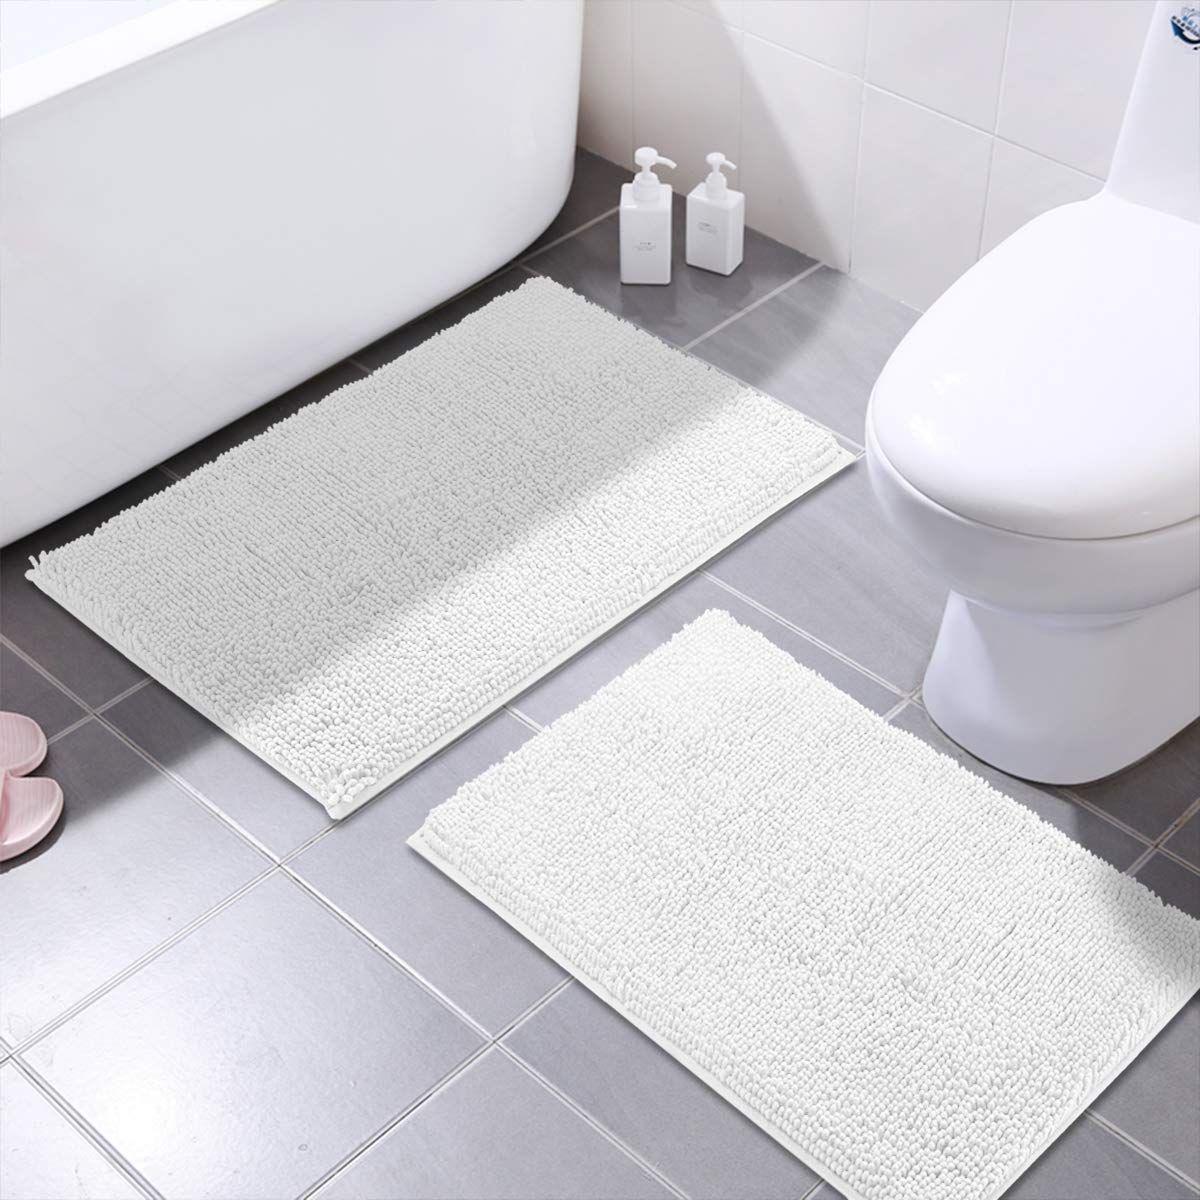 Mayshine Bath Mats For Bathroom Rugs Non Slip Machine Washable Soft Microfiber 2 Pack 20 32 Inches Read More Revie Washable Bath Mat Shower Mat Bathroom Rugs [ 1200 x 1200 Pixel ]